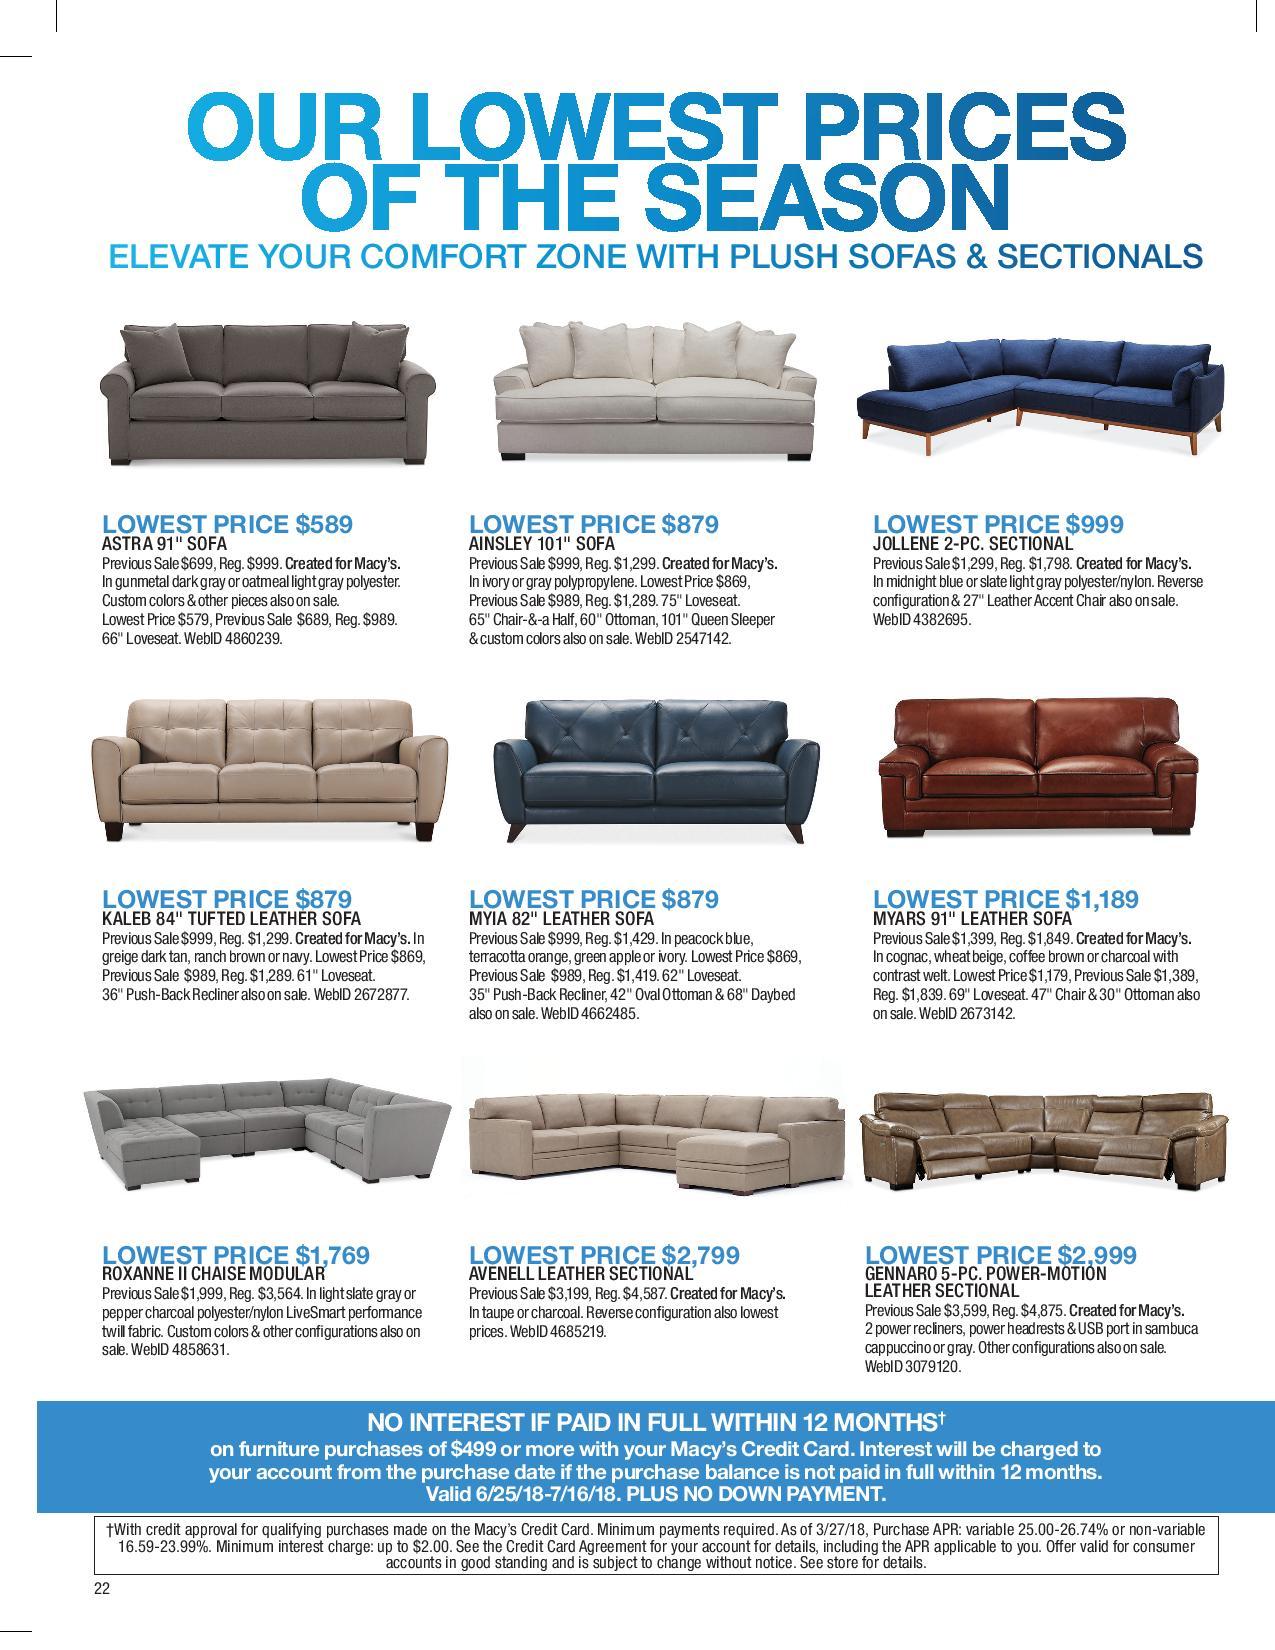 Tremendous Macys Furniture Gallery Grand Re Opening Walden Galleria Machost Co Dining Chair Design Ideas Machostcouk